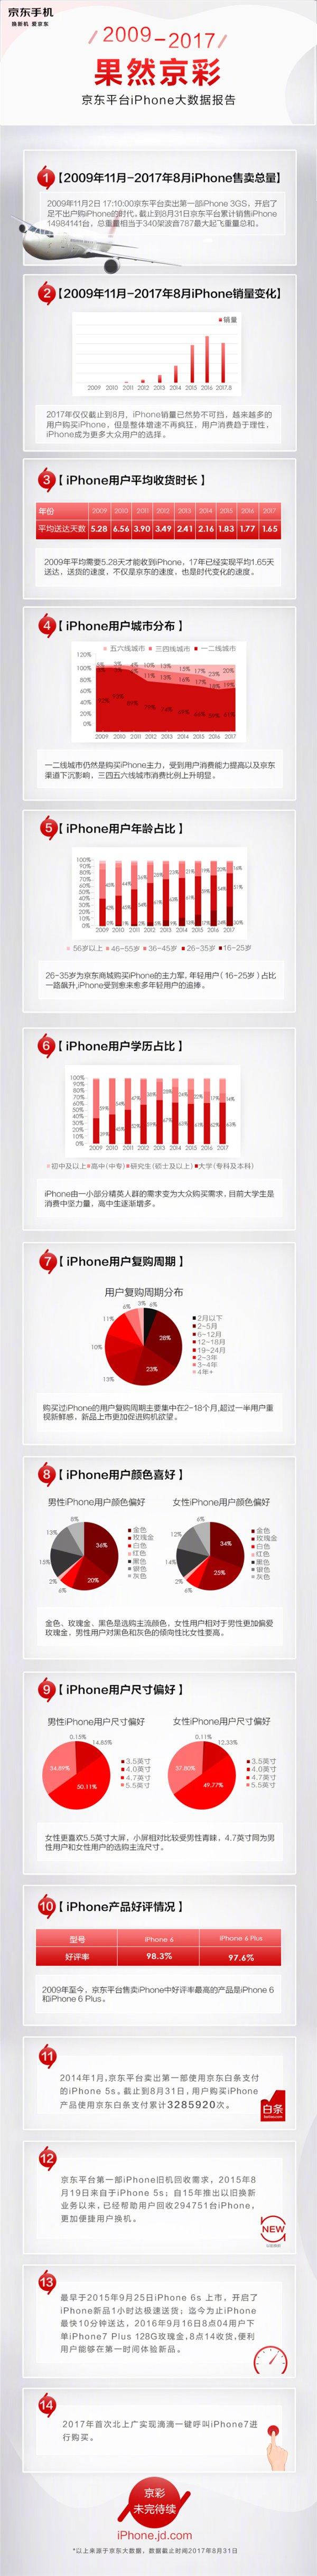 iPhone的销量